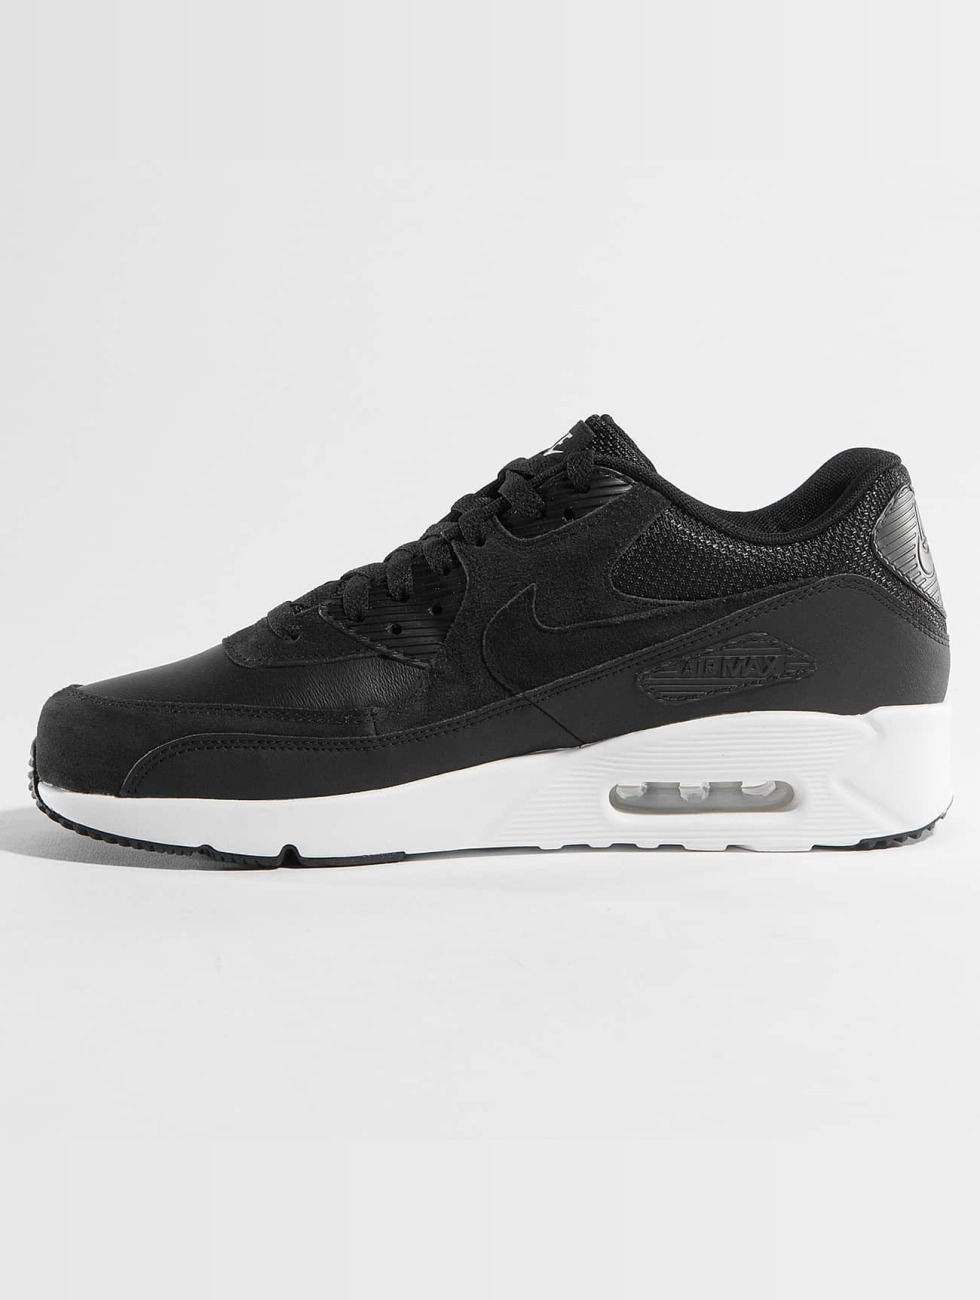 Goedkope Koop Perfect Manchester Grote Verkoop Te Koop Nike schoen / sneaker Air Max 90 Ultra 2.0 LTR in zwart 365306 Outlet Factory Outlet XZETU